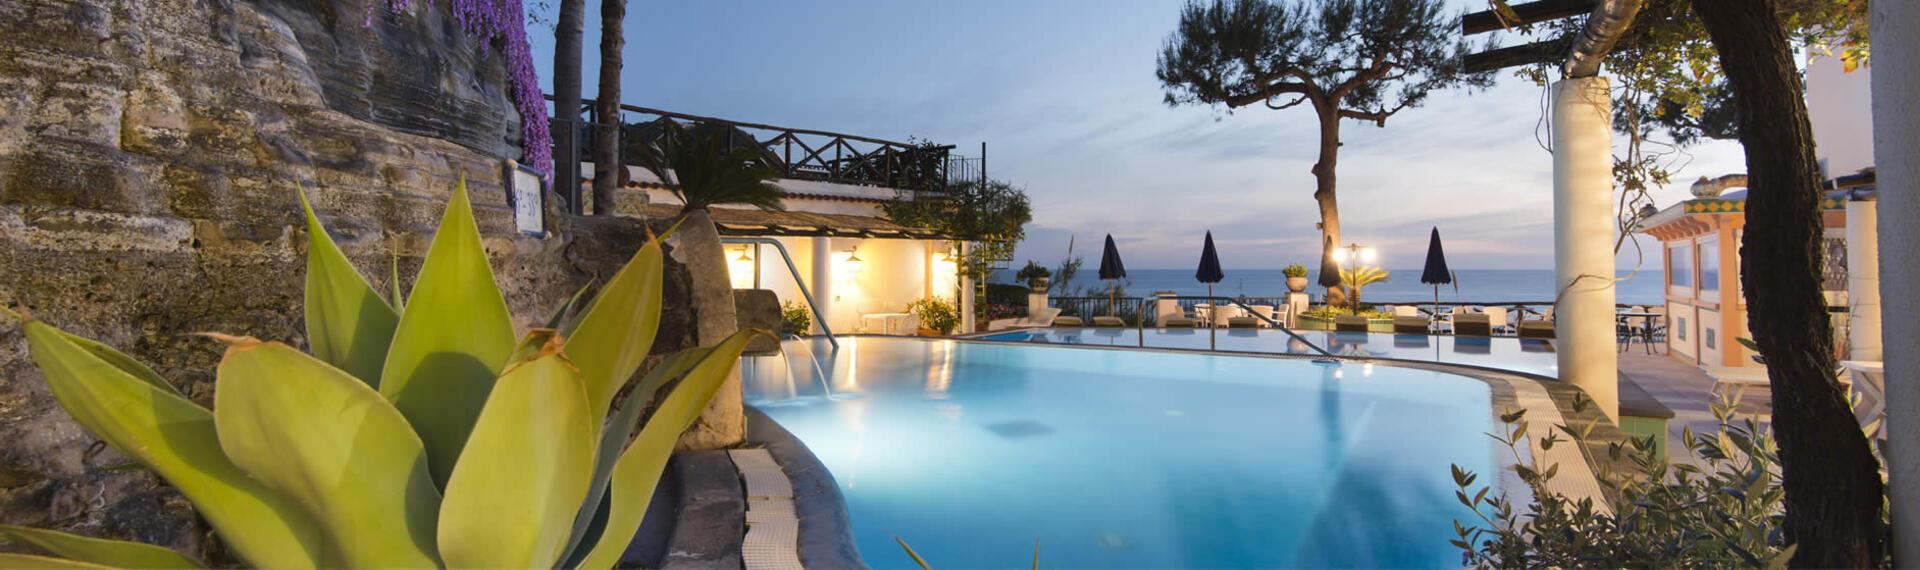 hotelvillabianca it offerta-estate-in-hotel-a-ischia 009